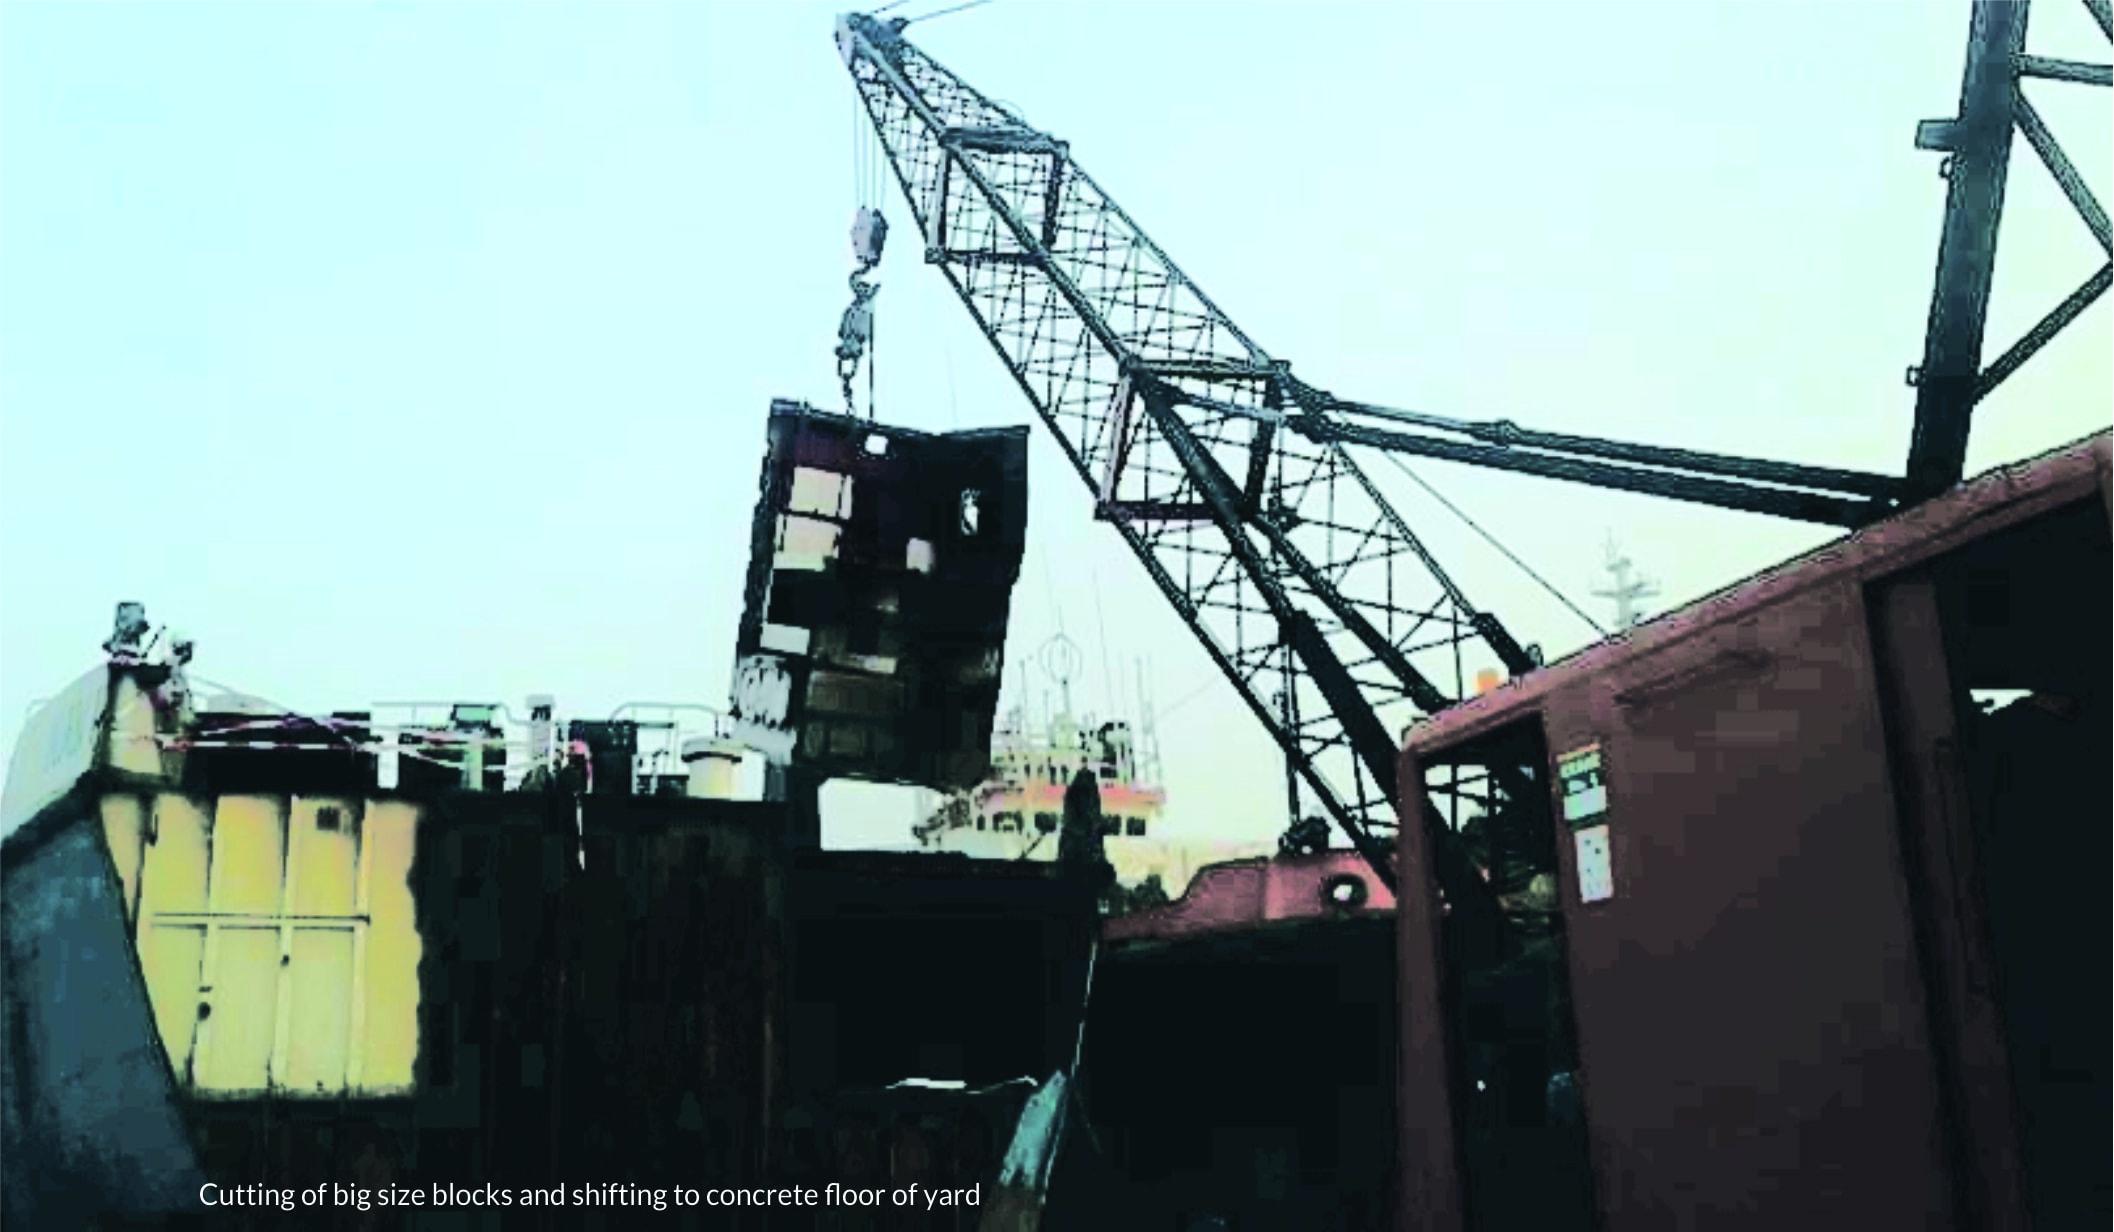 Alang Ship Recycling